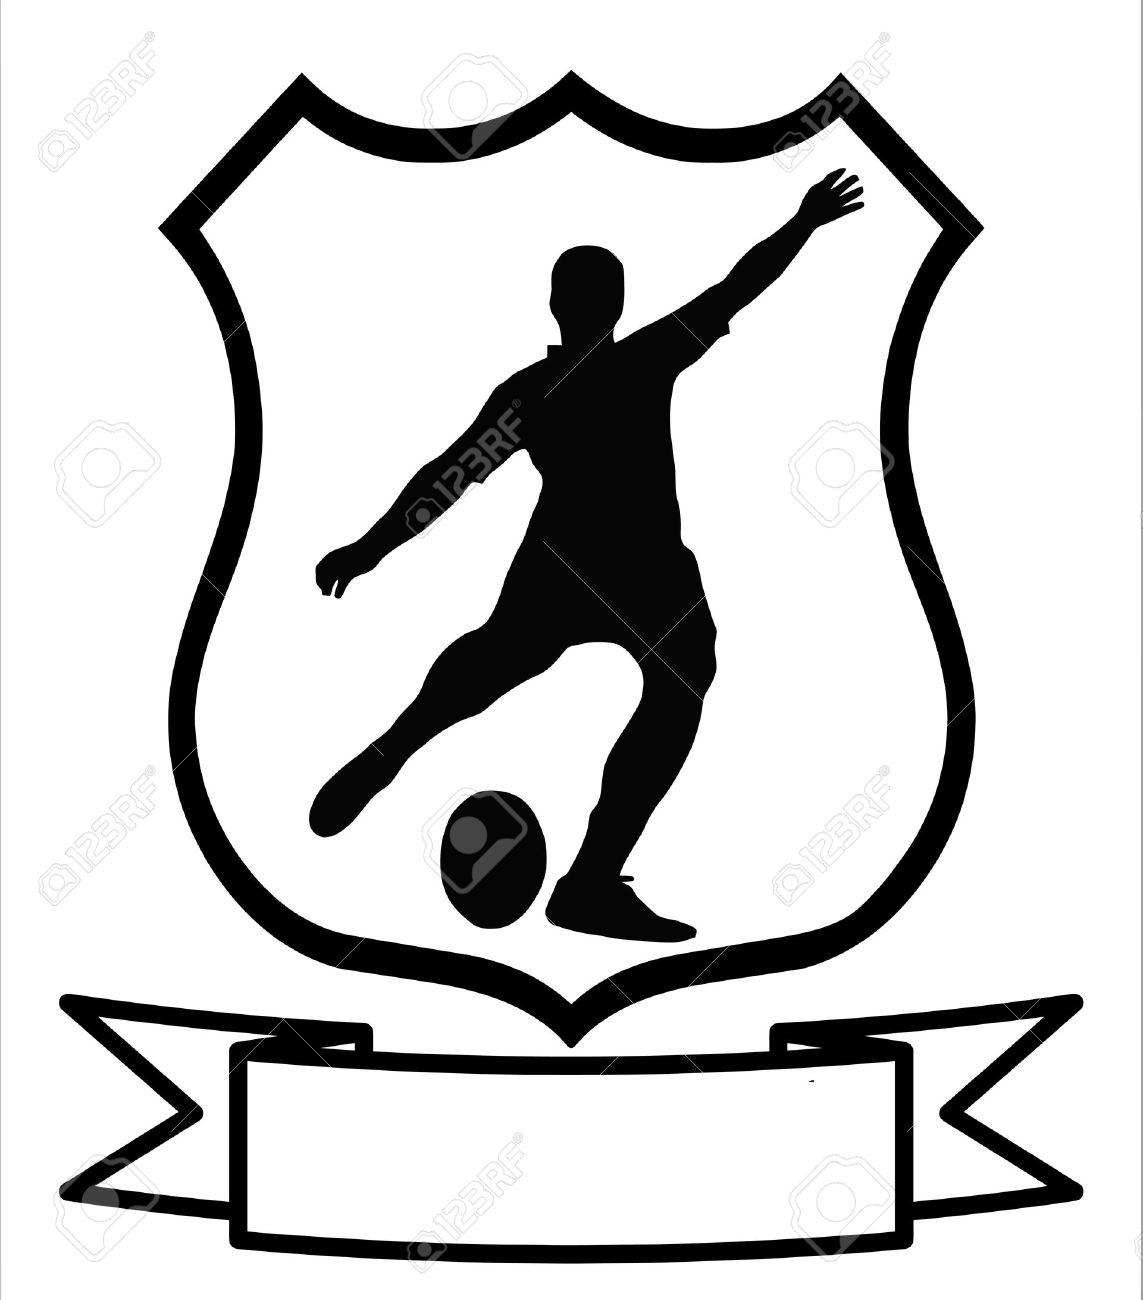 7c23e36b213b3 Foto de archivo - Rugby fútbol deporte emblema insignia escudo logotipo  Insignia escudo